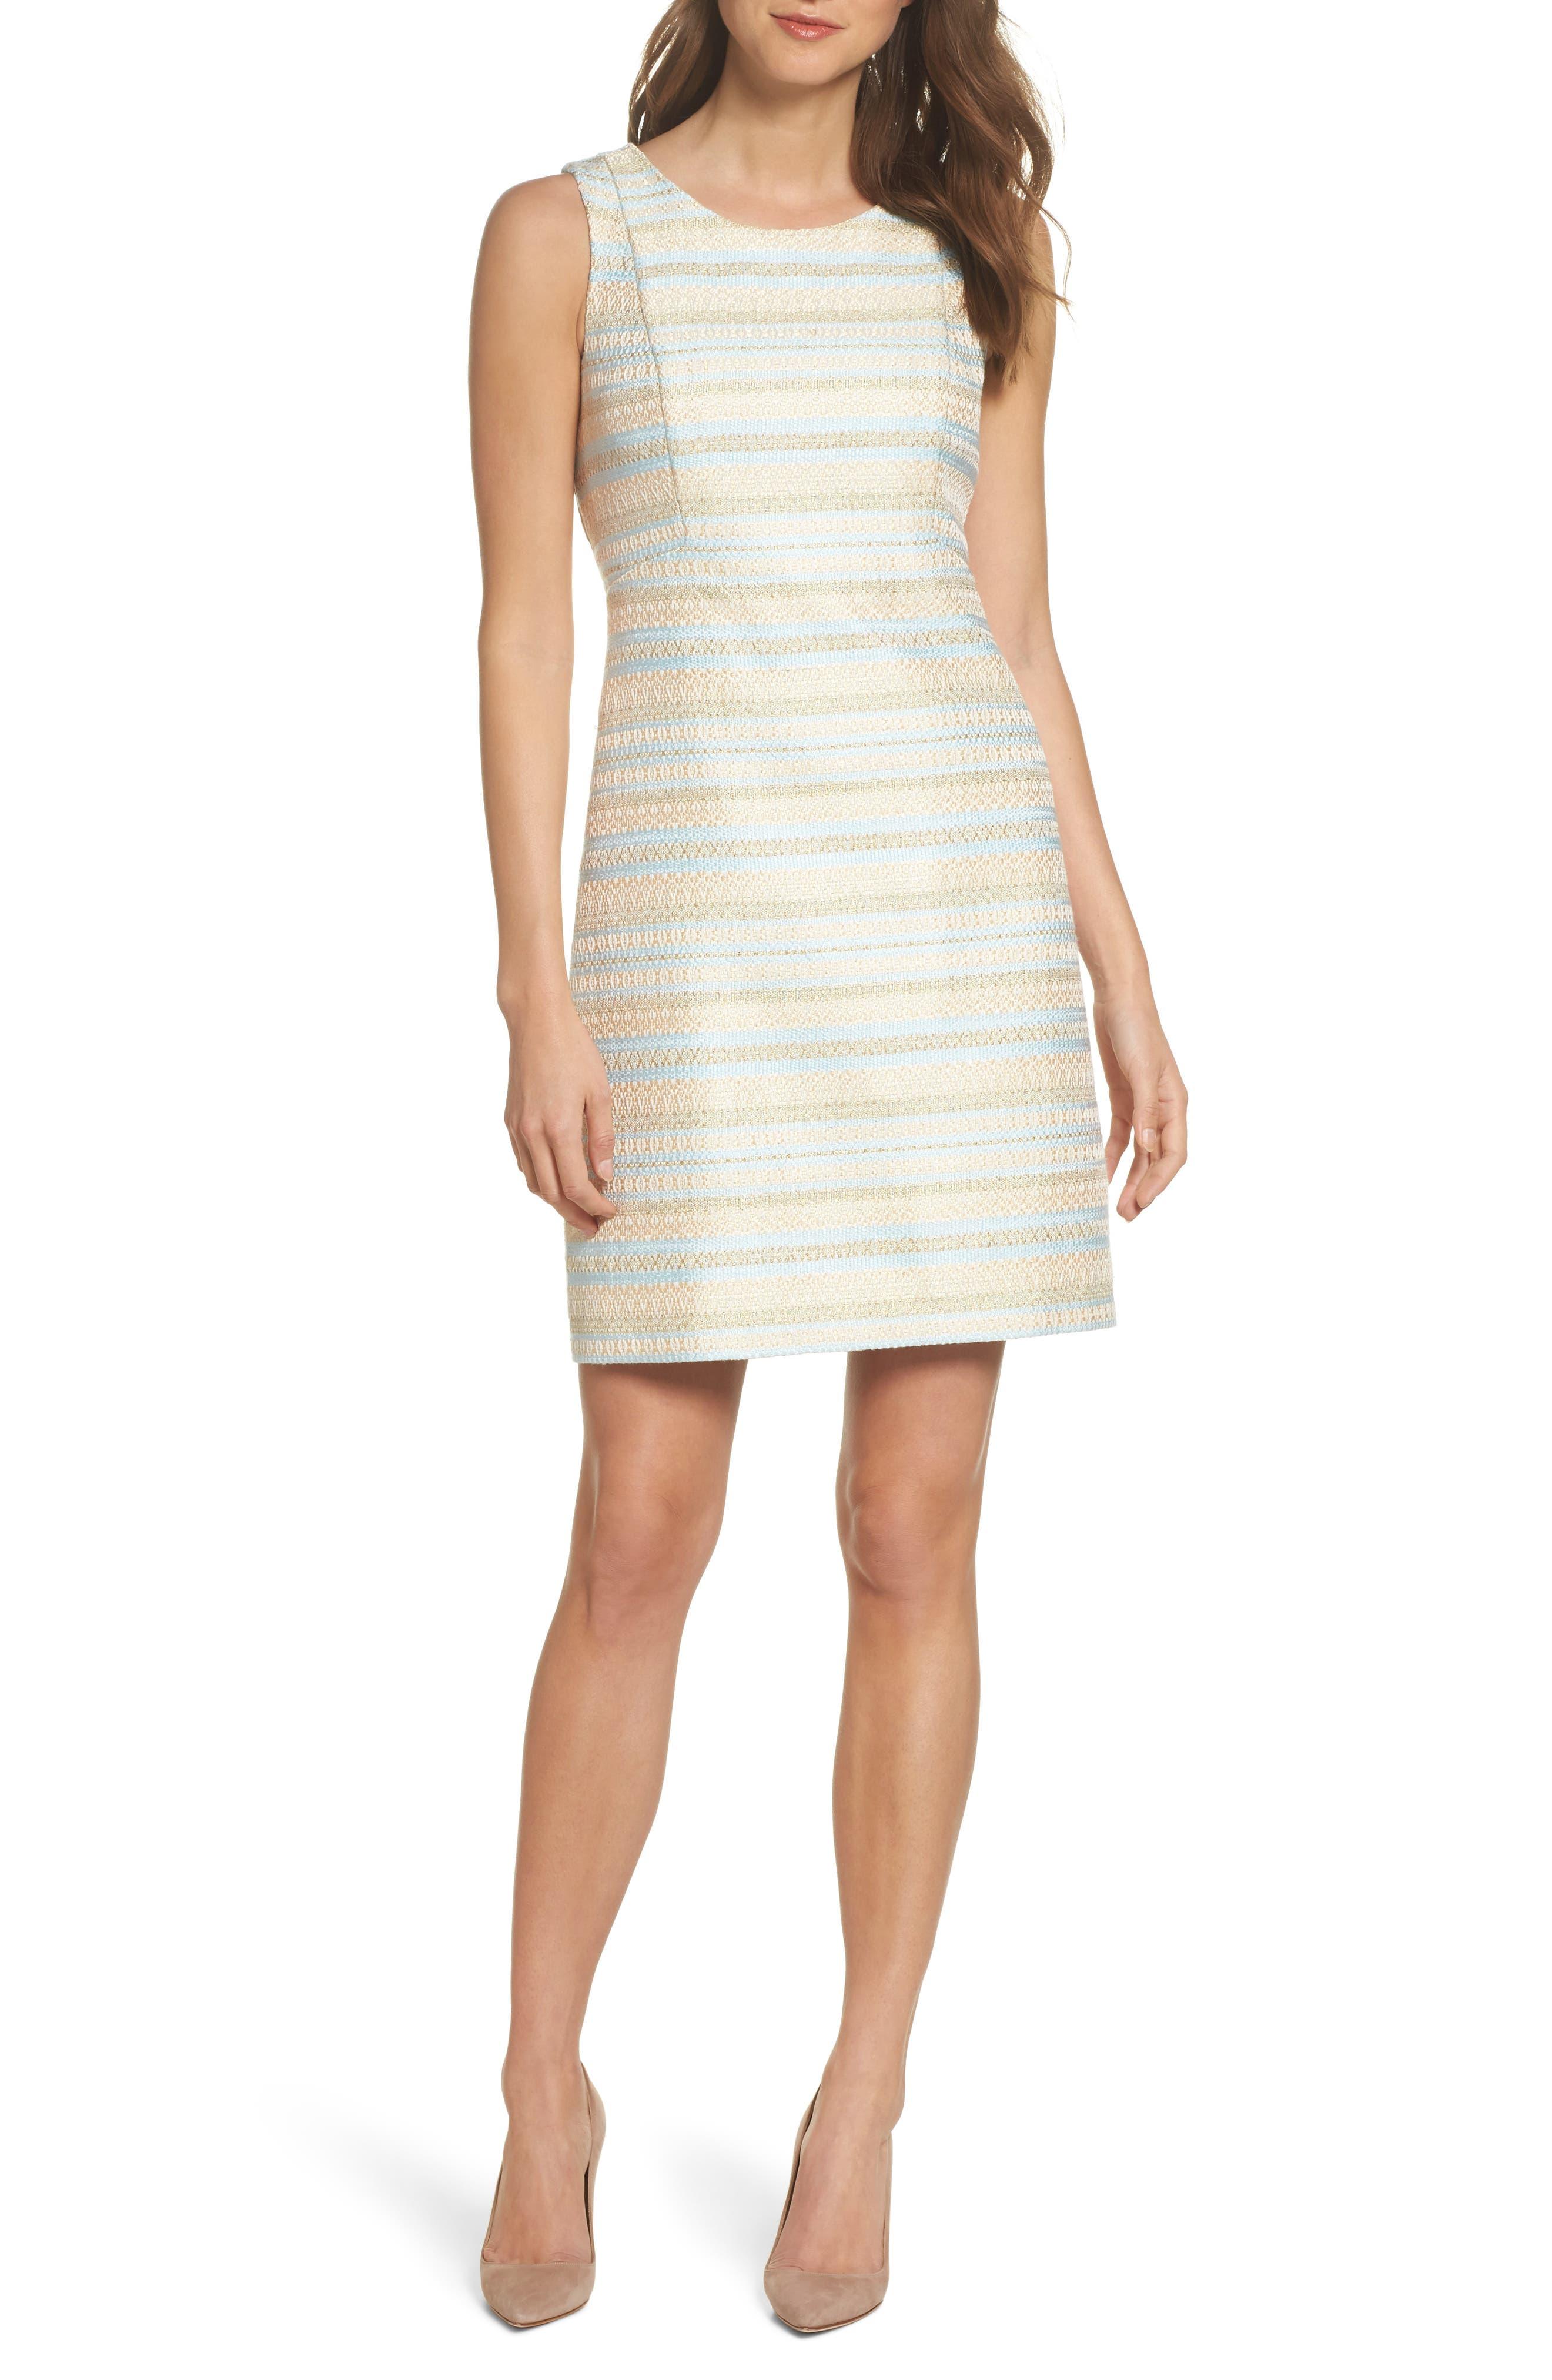 Eliza J Metallic Tweed Sheath Dress